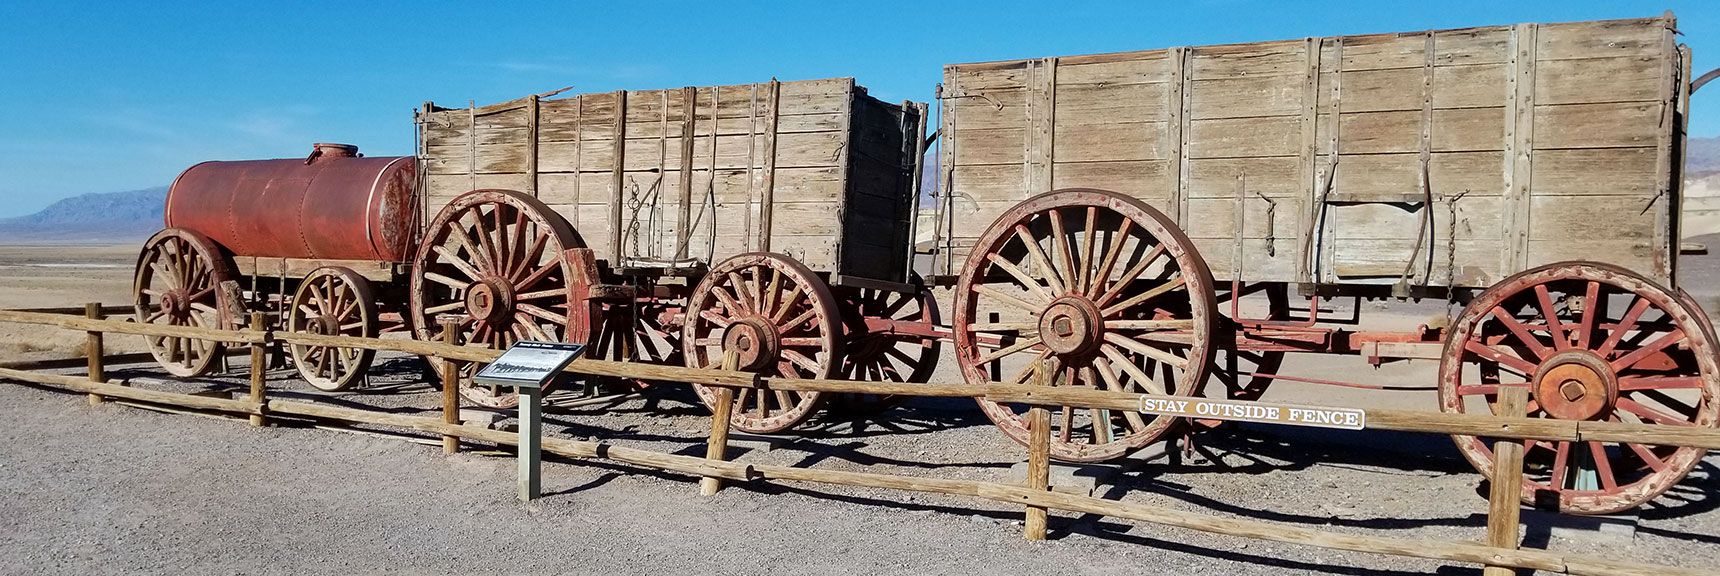 Death Valley National Park Harmony Borax Works November 24th 2018